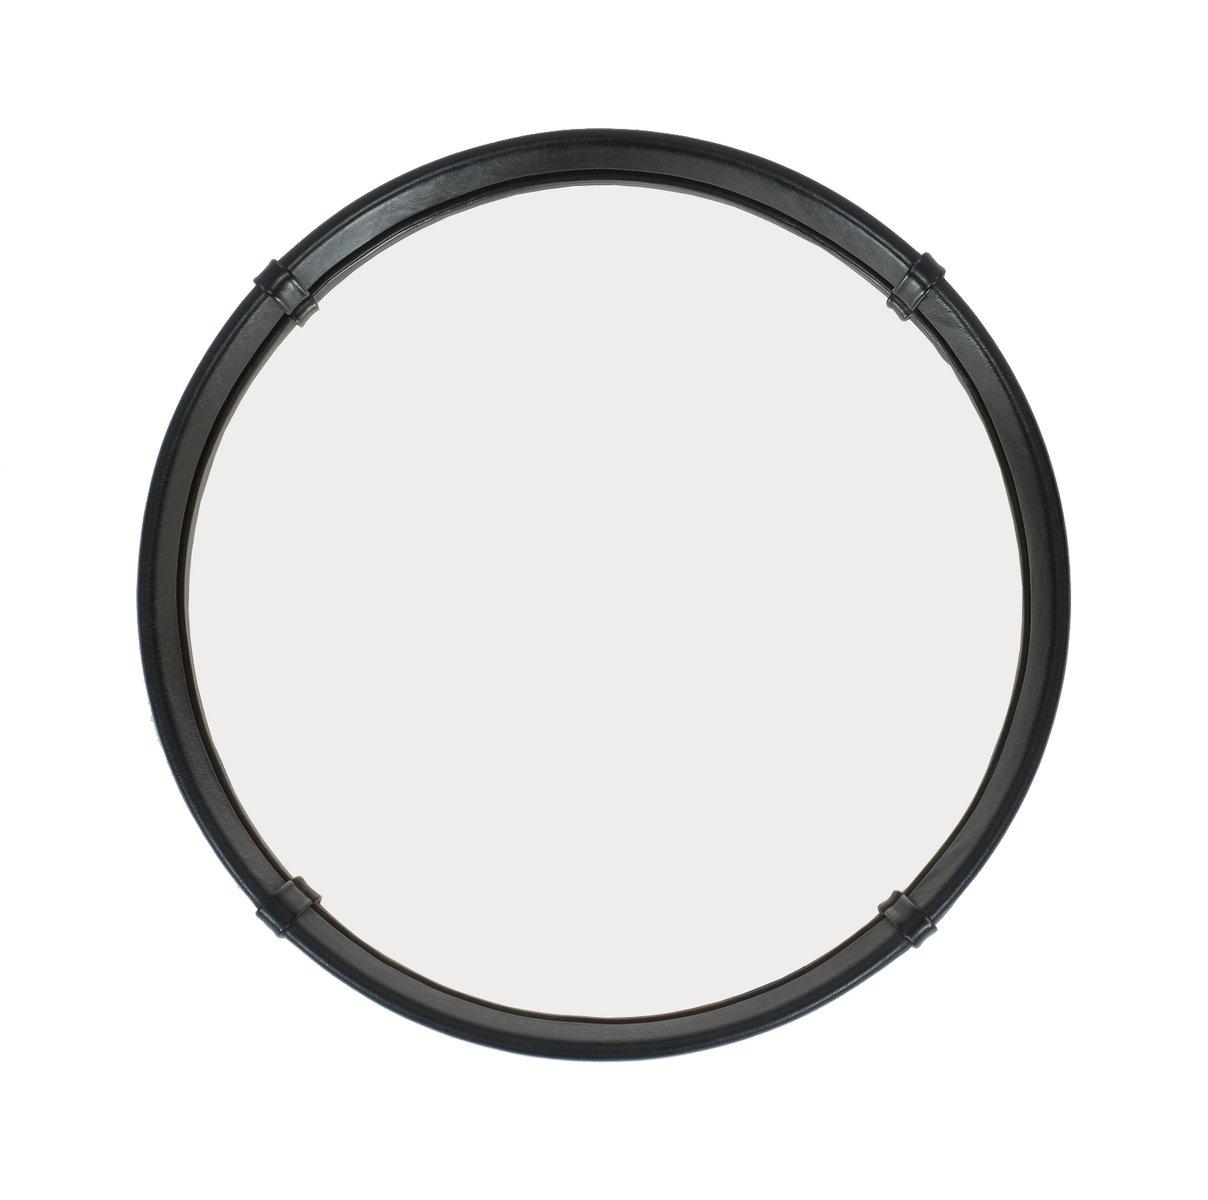 Miroir circulaire mid century recouvert de cuir par pace for Miroir circulaire